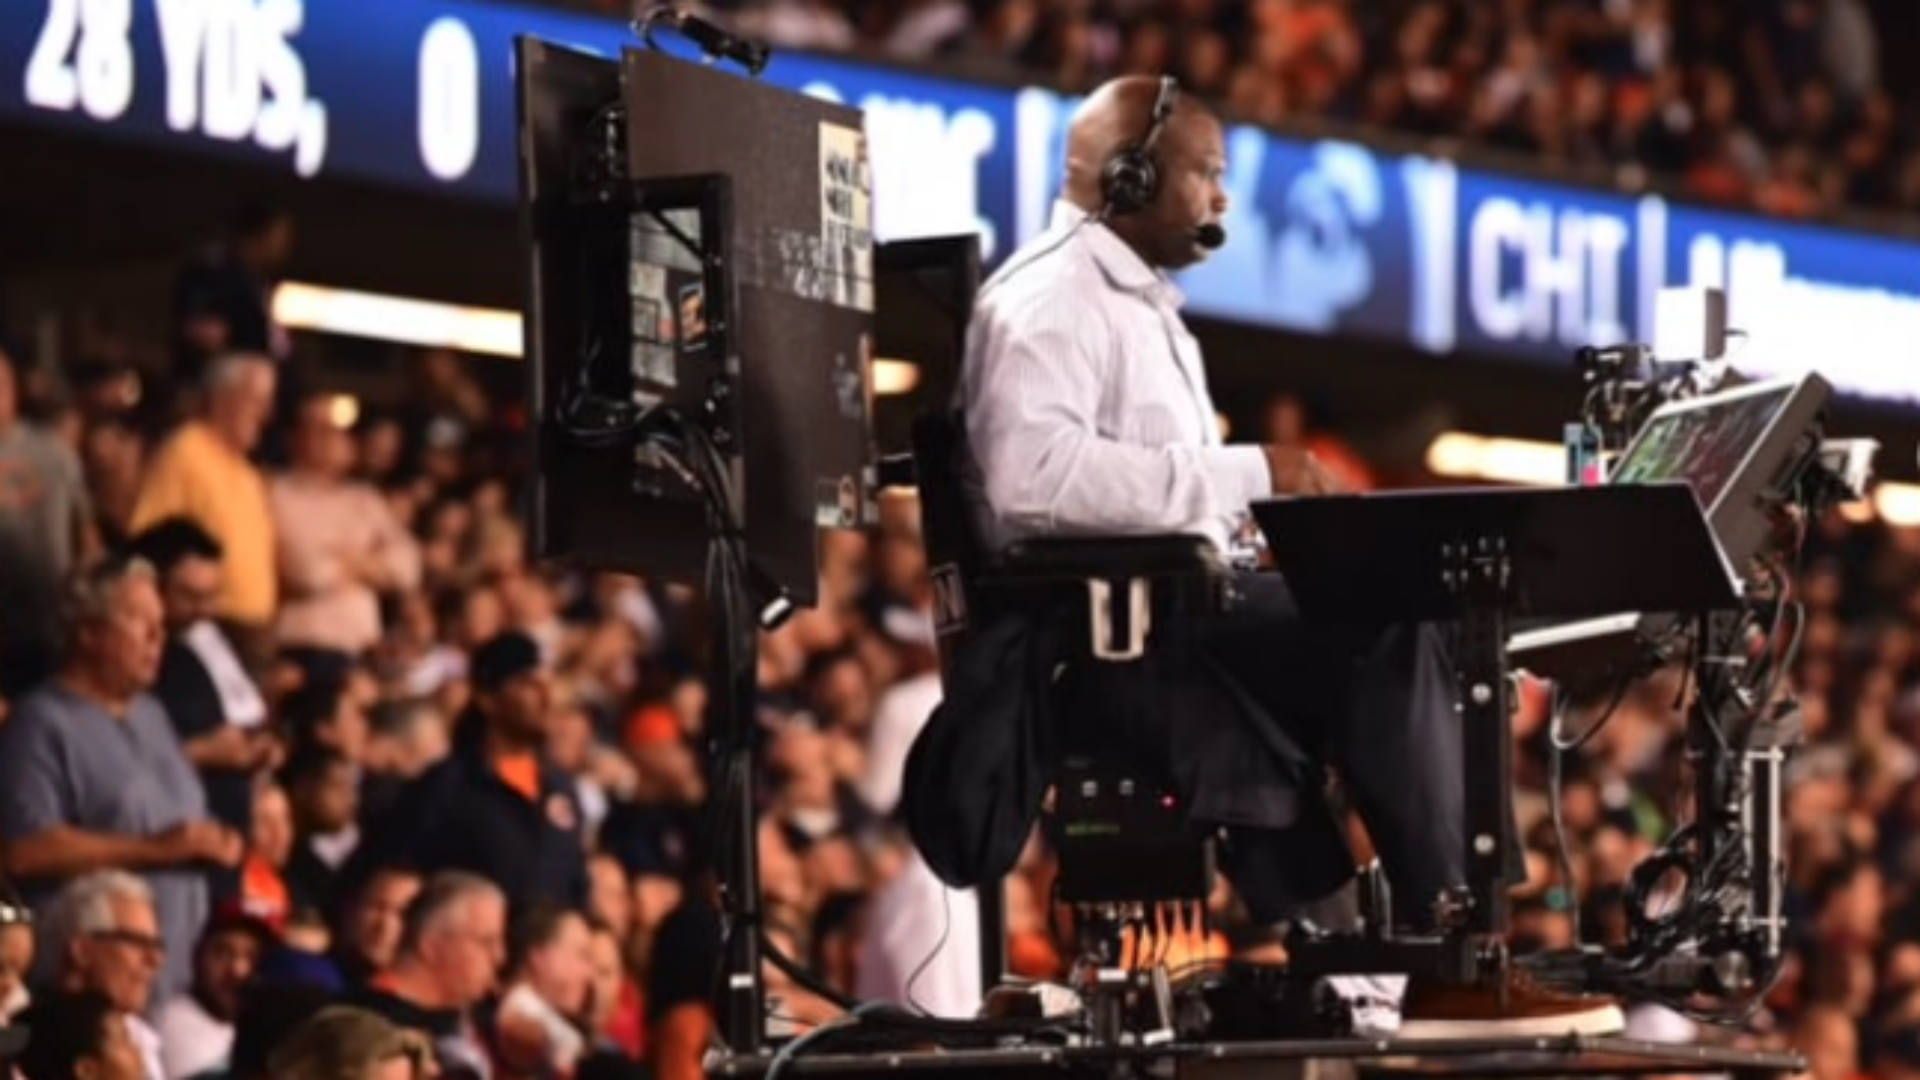 ESPN's 'BoogerMobile' won't return to 'Monday Night Football,' sources say